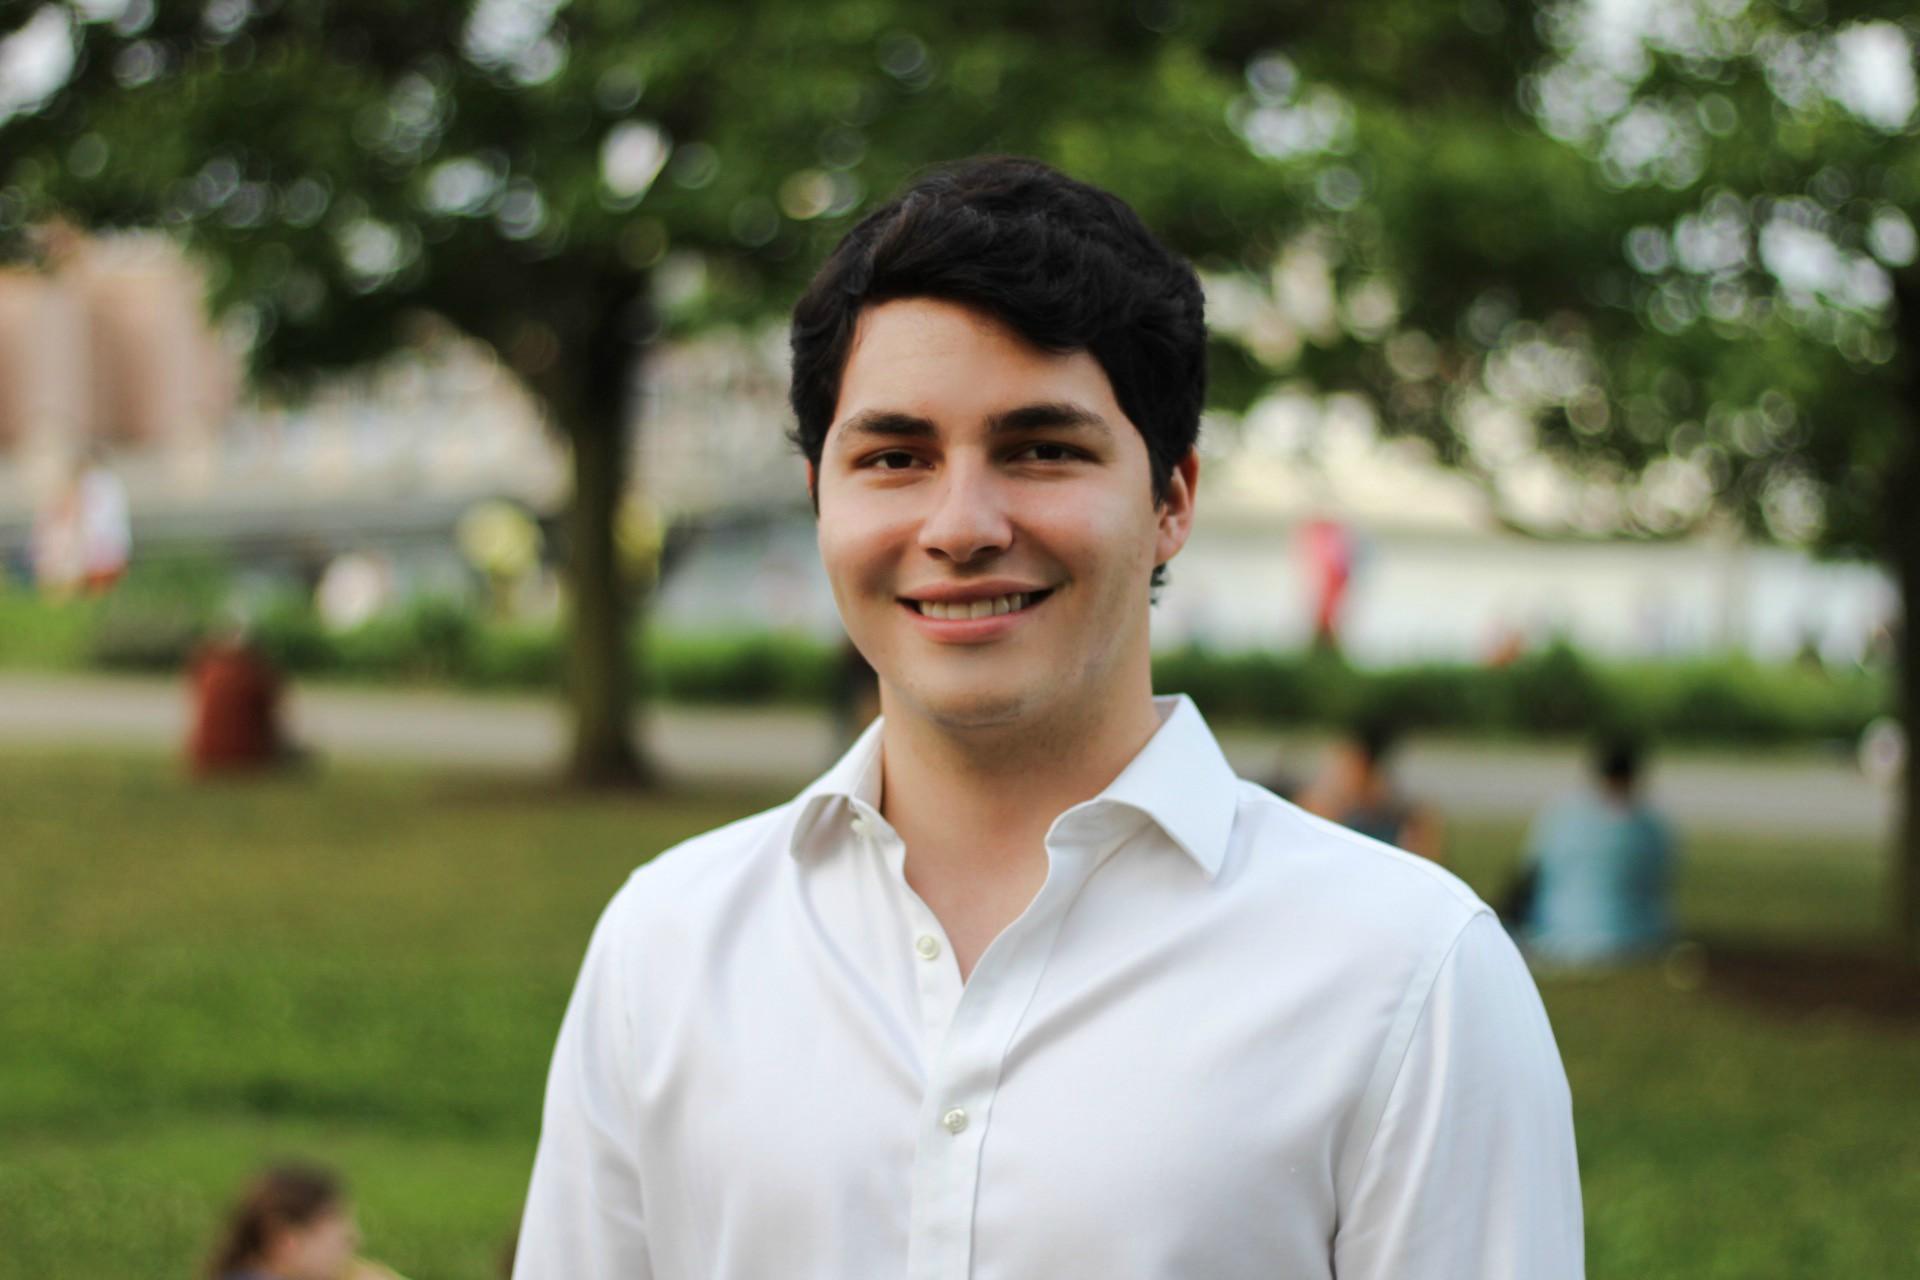 Alumni, Jorge Ortiz, describes why chose North Park.